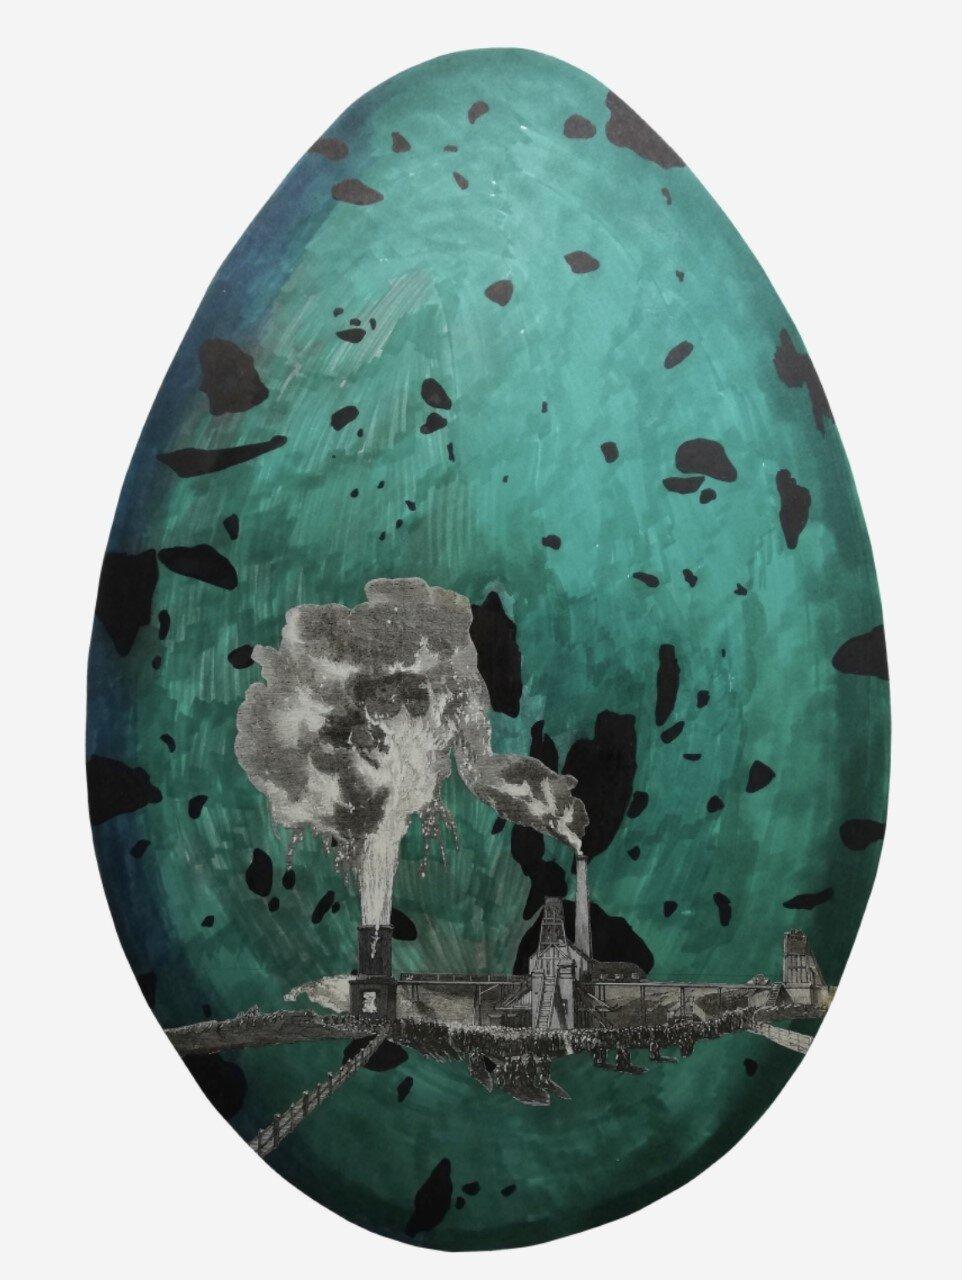 Joanna Rajkoswka,  Egg-Earth  (Industrial Revolution), 2019 Collage on hand-made paper